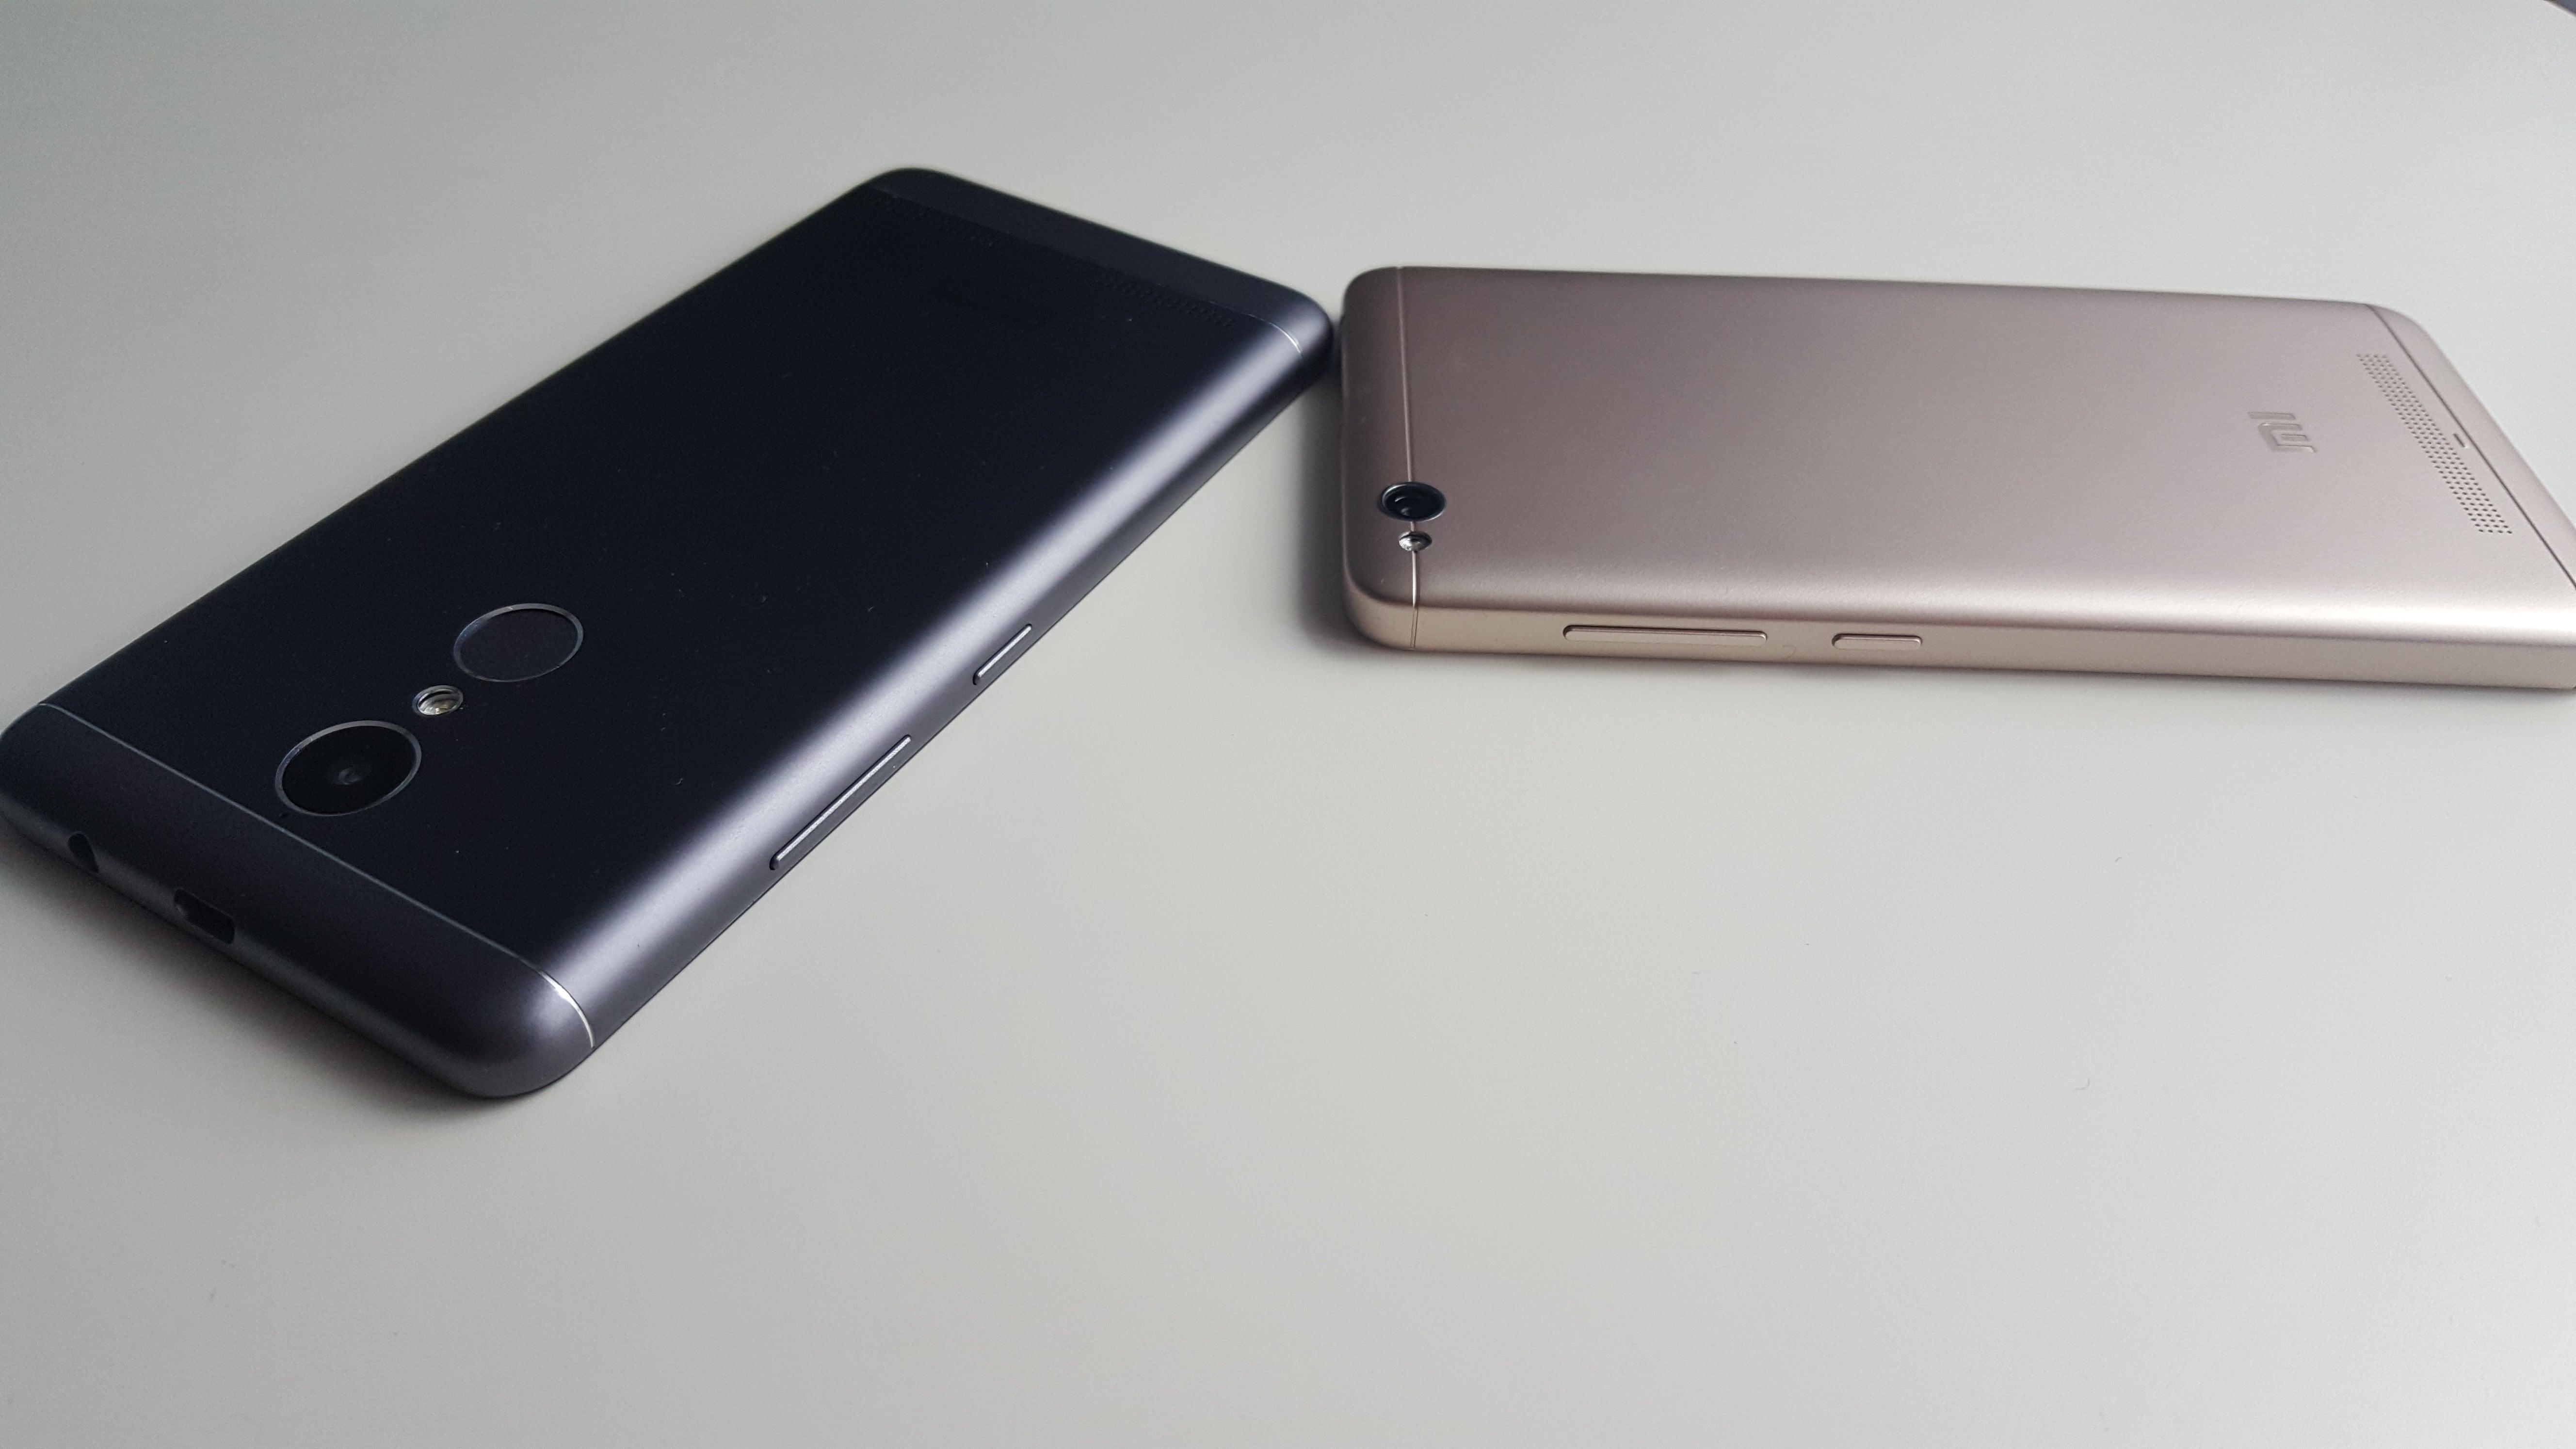 Tabletowo Por³wnanie Lenovo K6 Power vs Xiaomi Redmi 4A Android Lenovo Por³wnania Smartfony